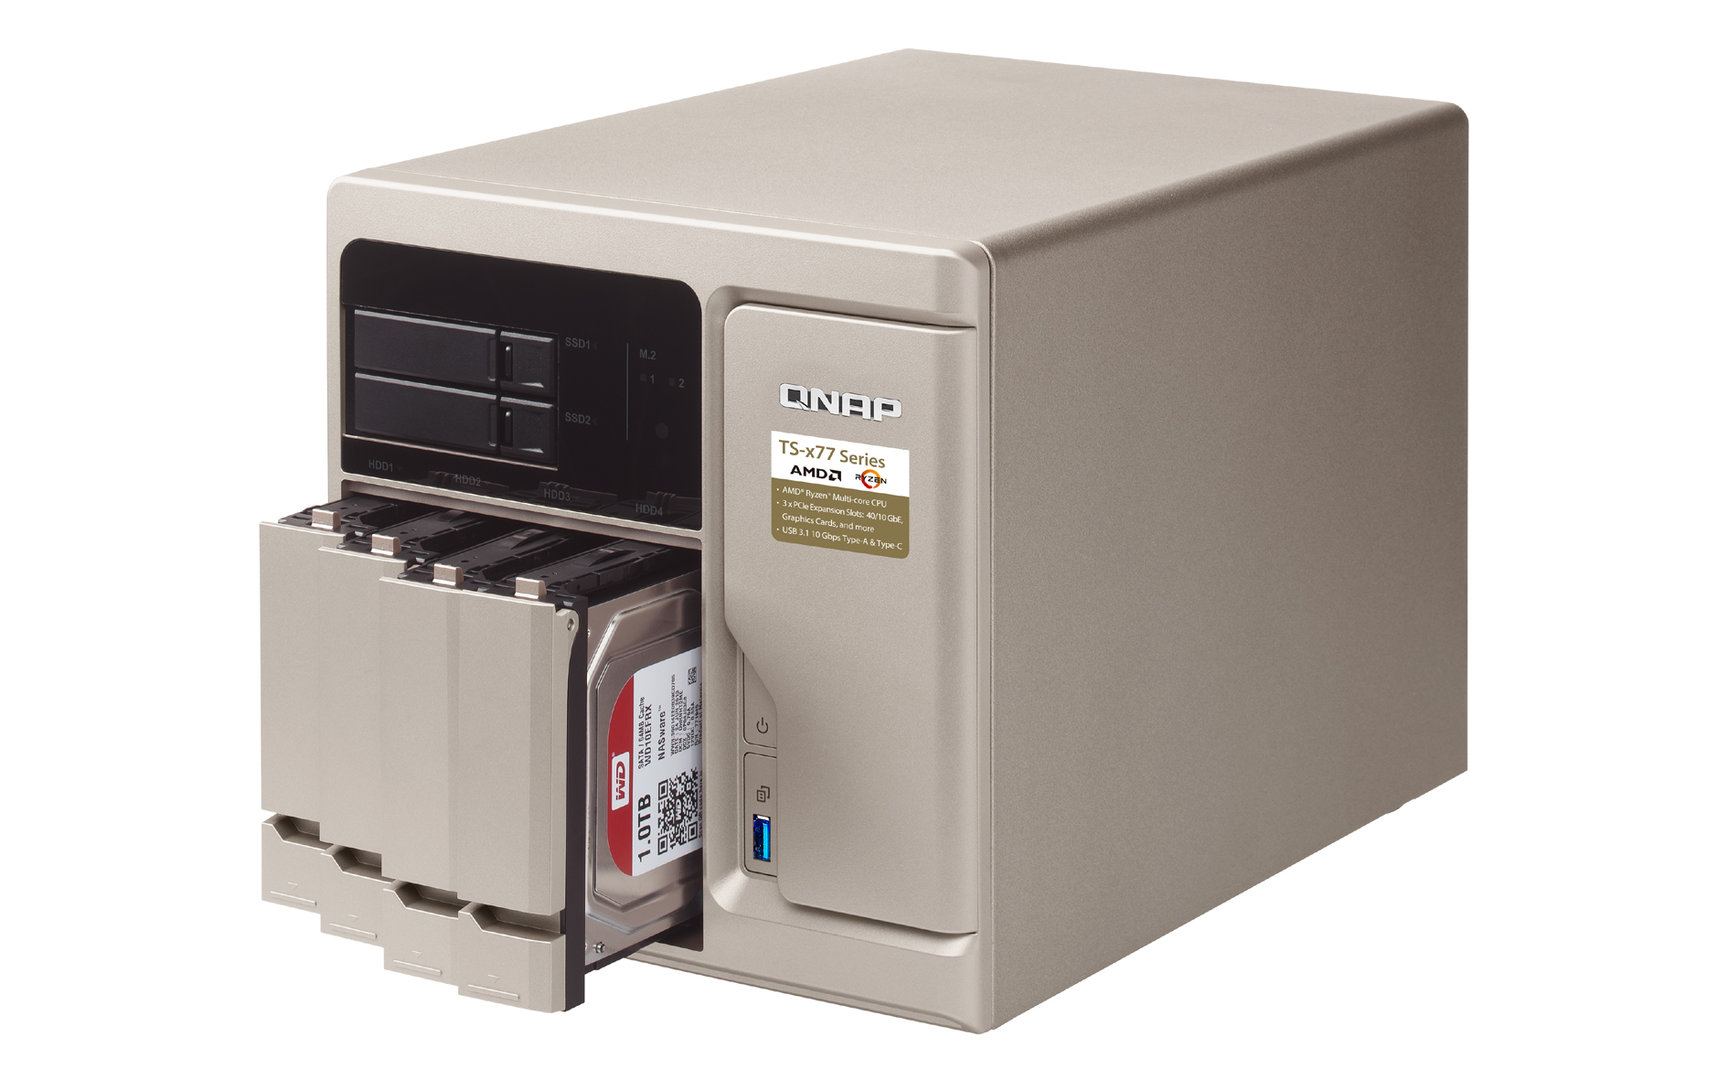 QNAP TS-677 mit Ryzen 5 1600